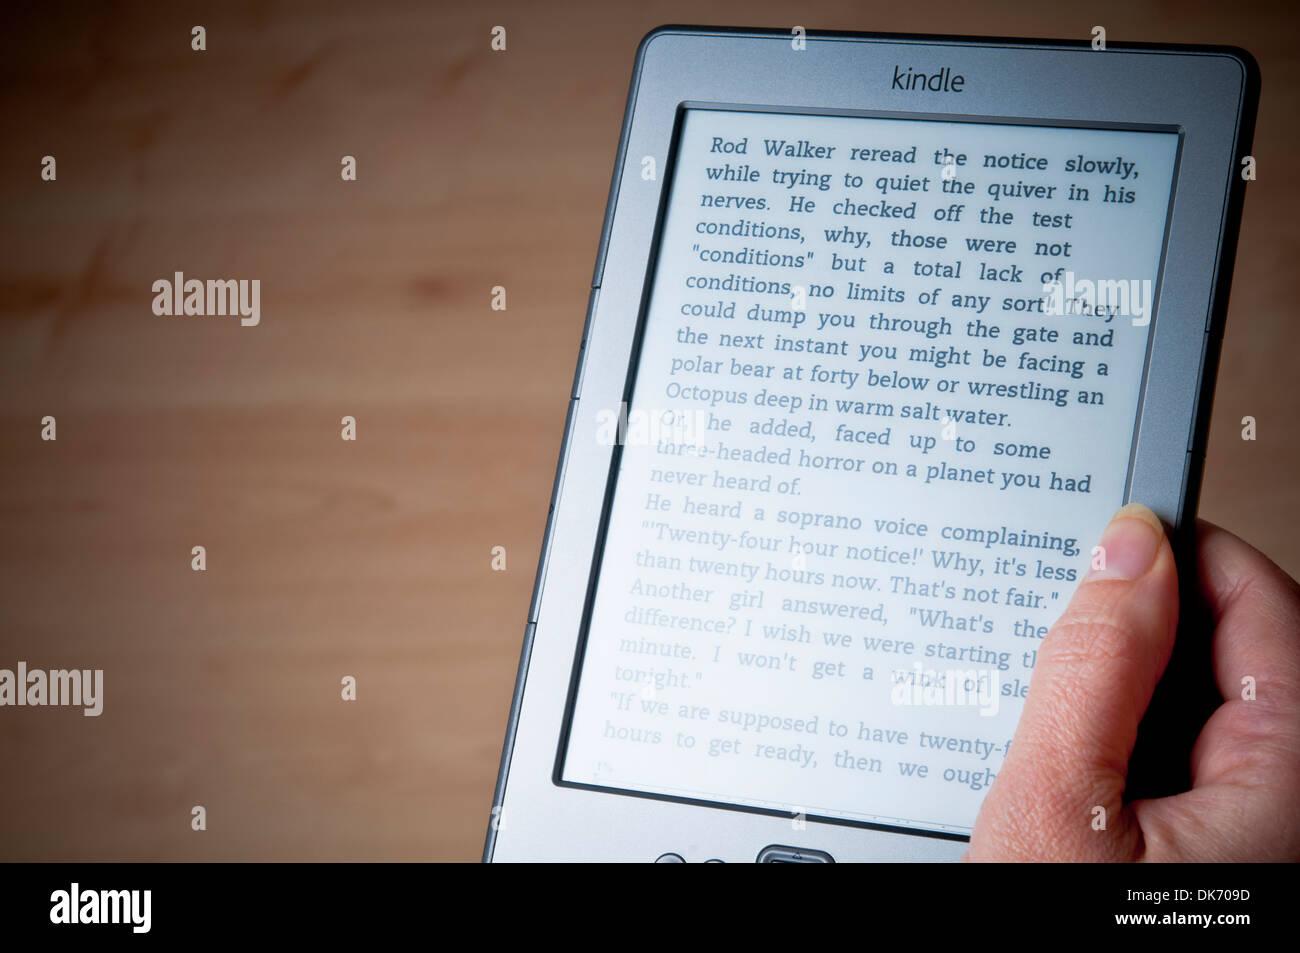 Femme main tenant un Kindle e-book reader Photo Stock